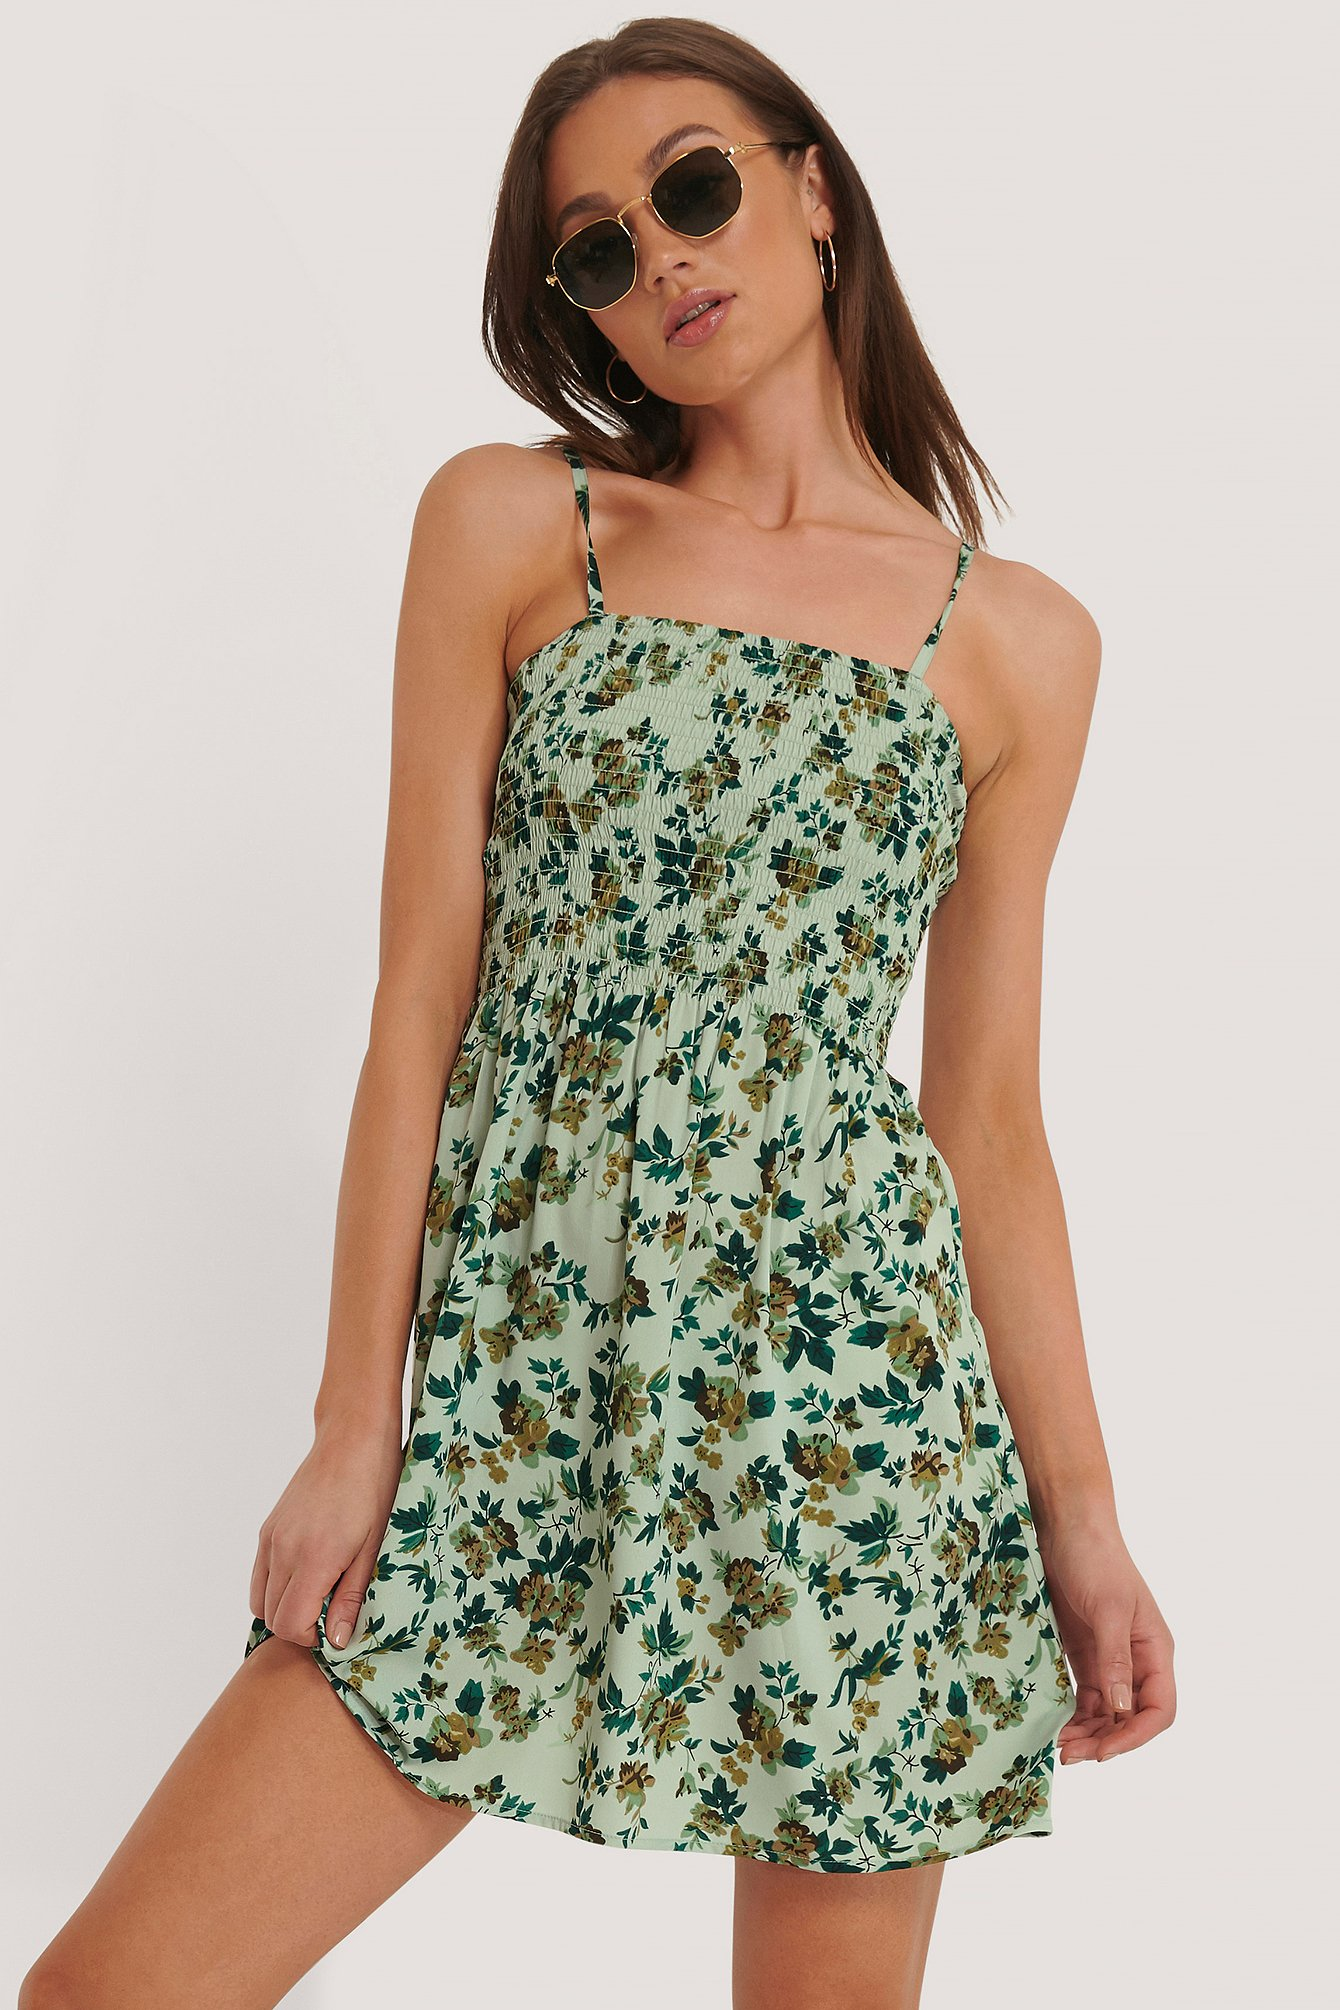 NA-KD Smocked Strap Dress - Green